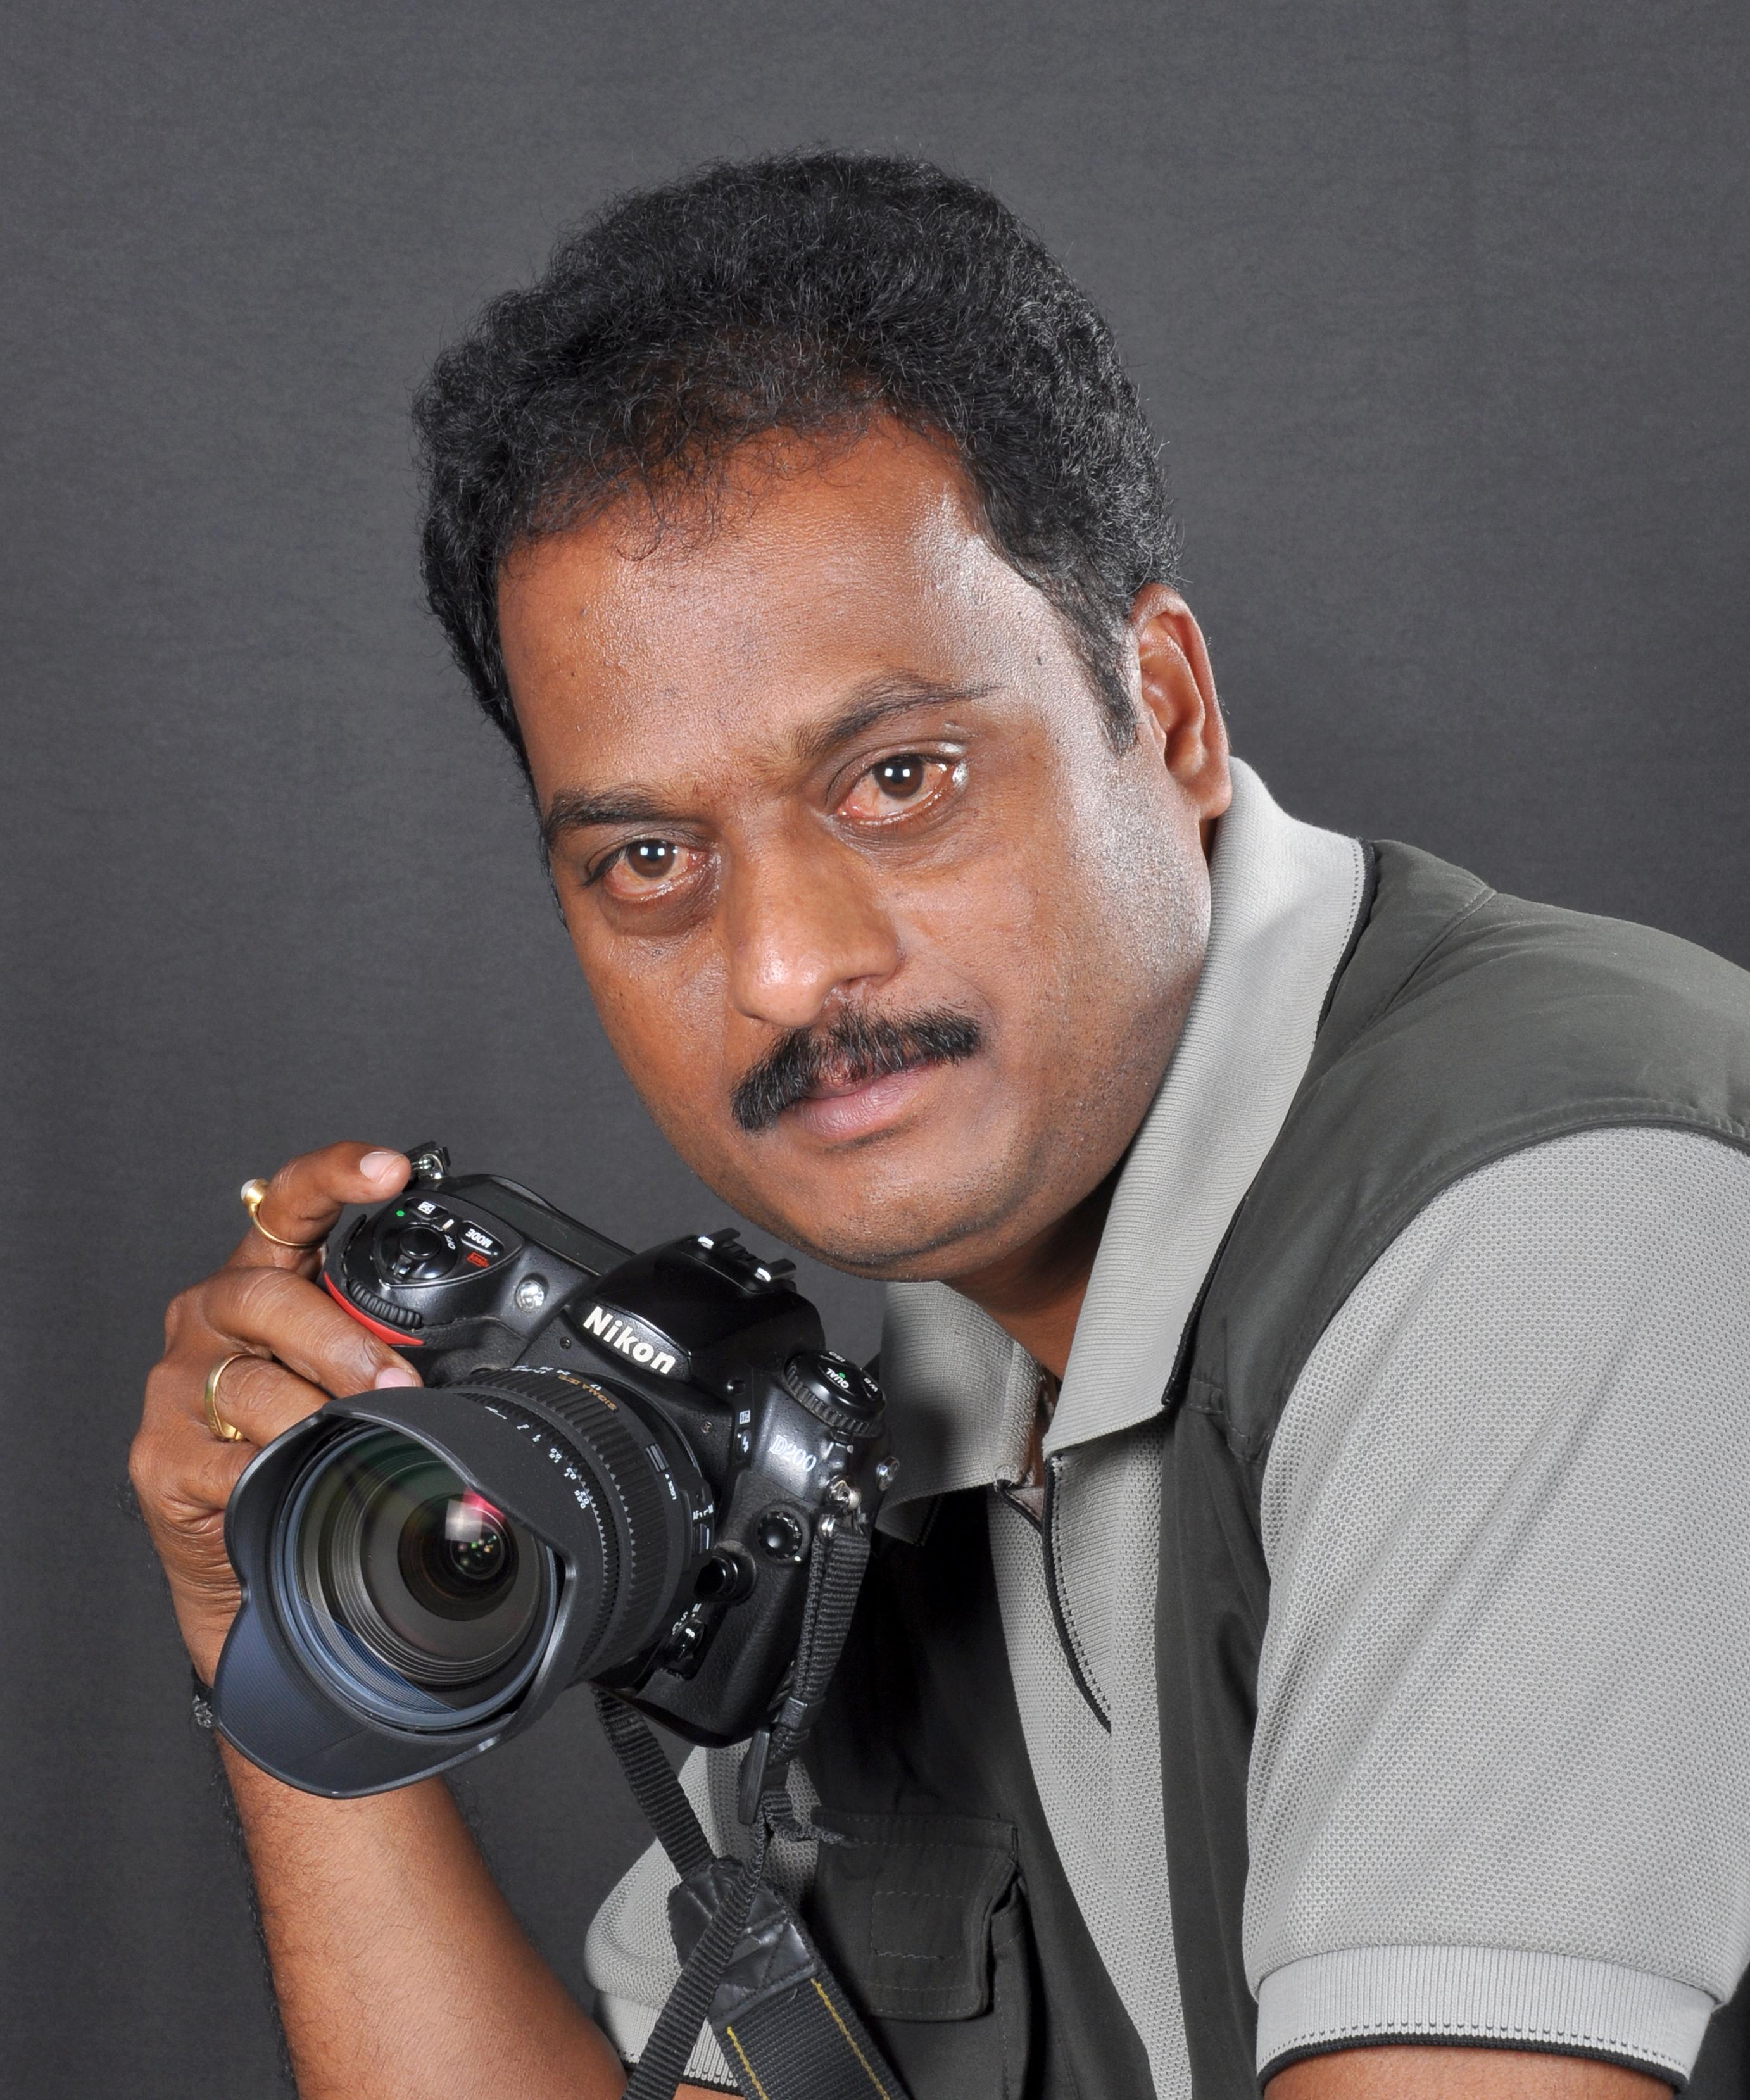 K.S.Srinivasa